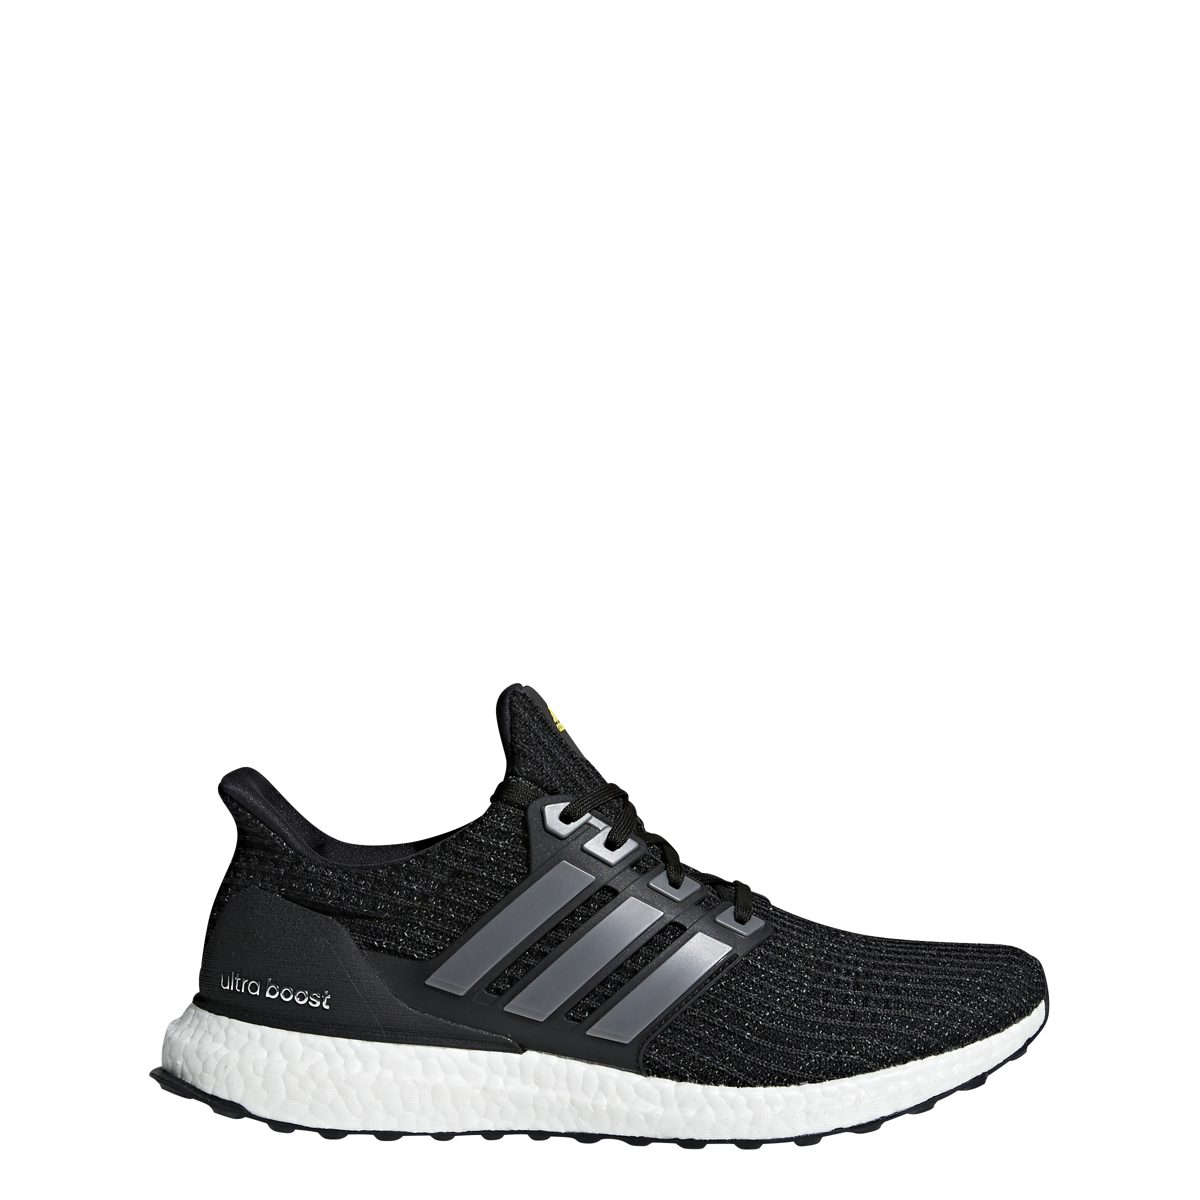 a77d943f6ee Adidas UltraBoost LTD 5 Yr Anniversary in Black White — MAJOR